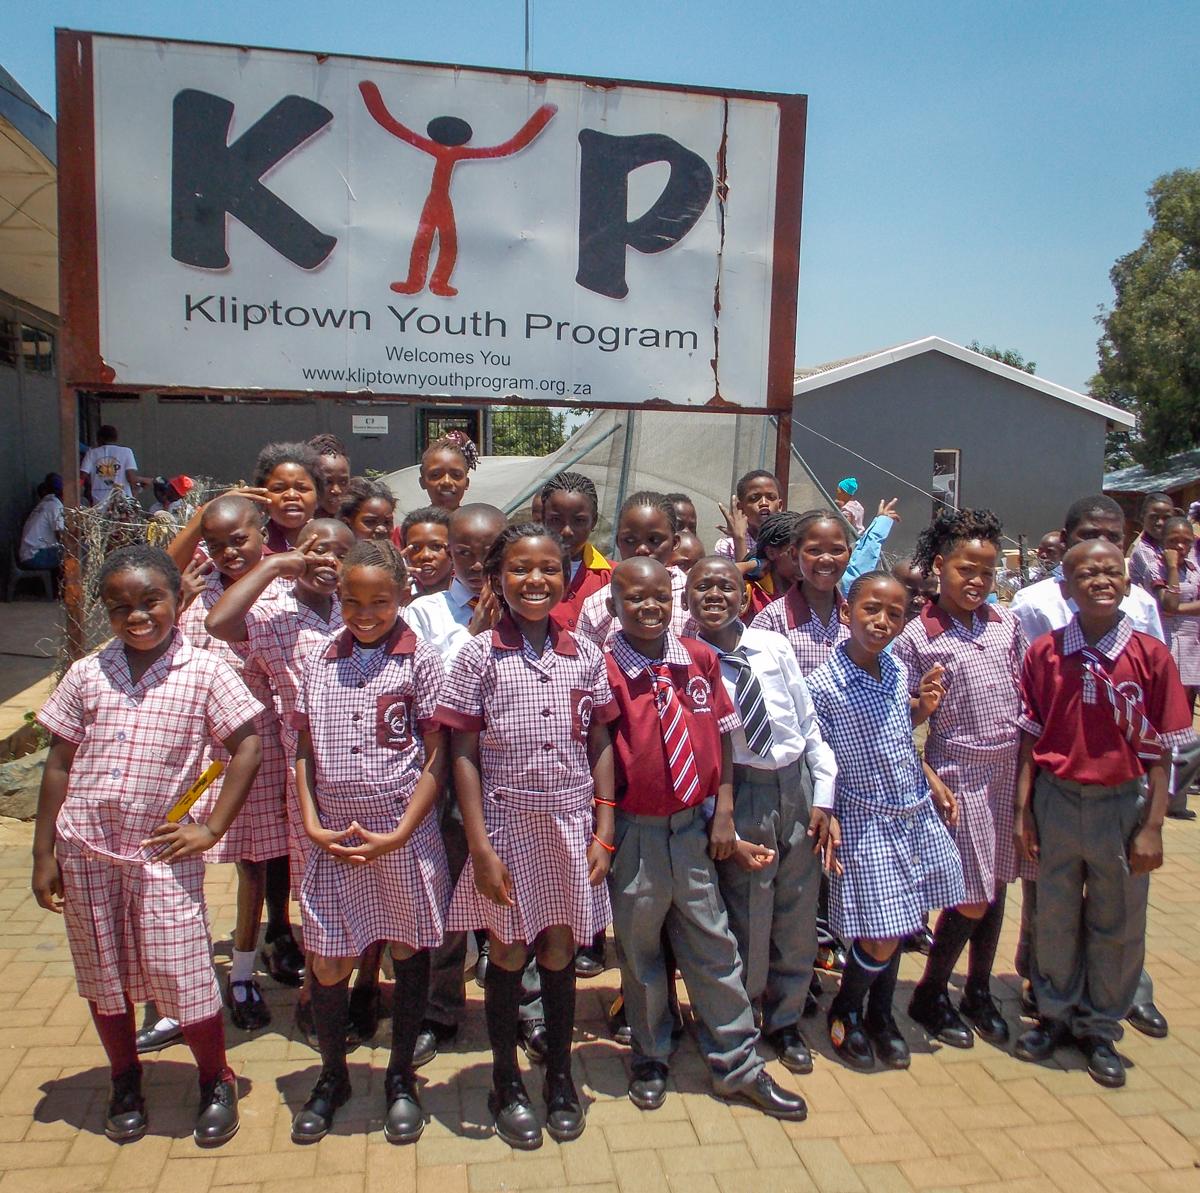 KYP Uniform Ceremony 2014 (6 of 8)